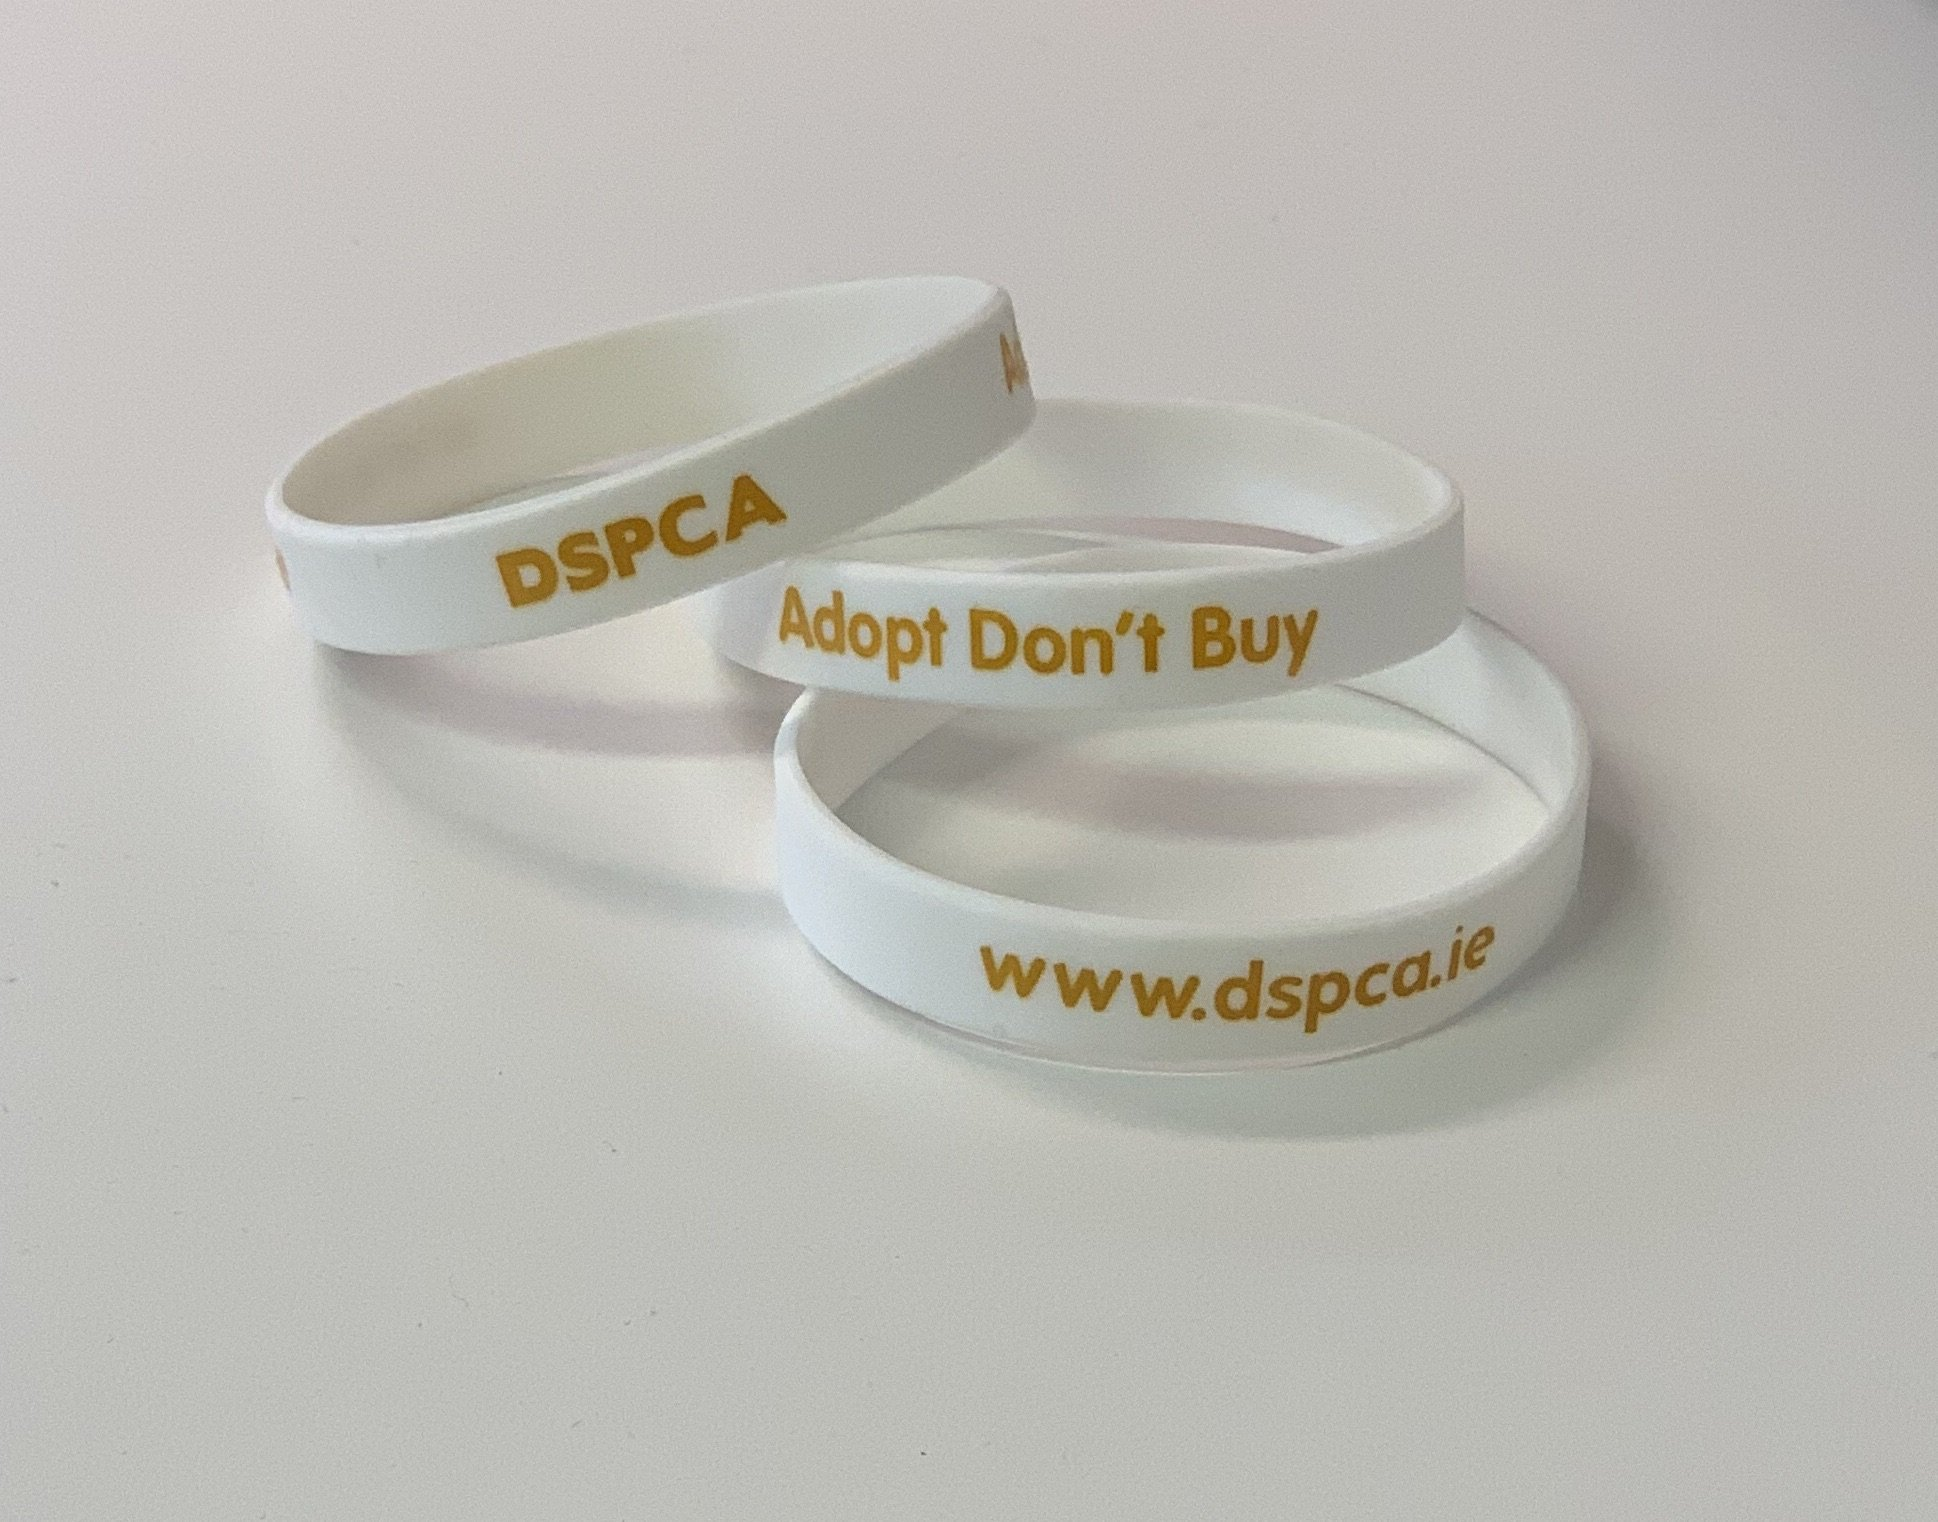 DSPCA Wristband